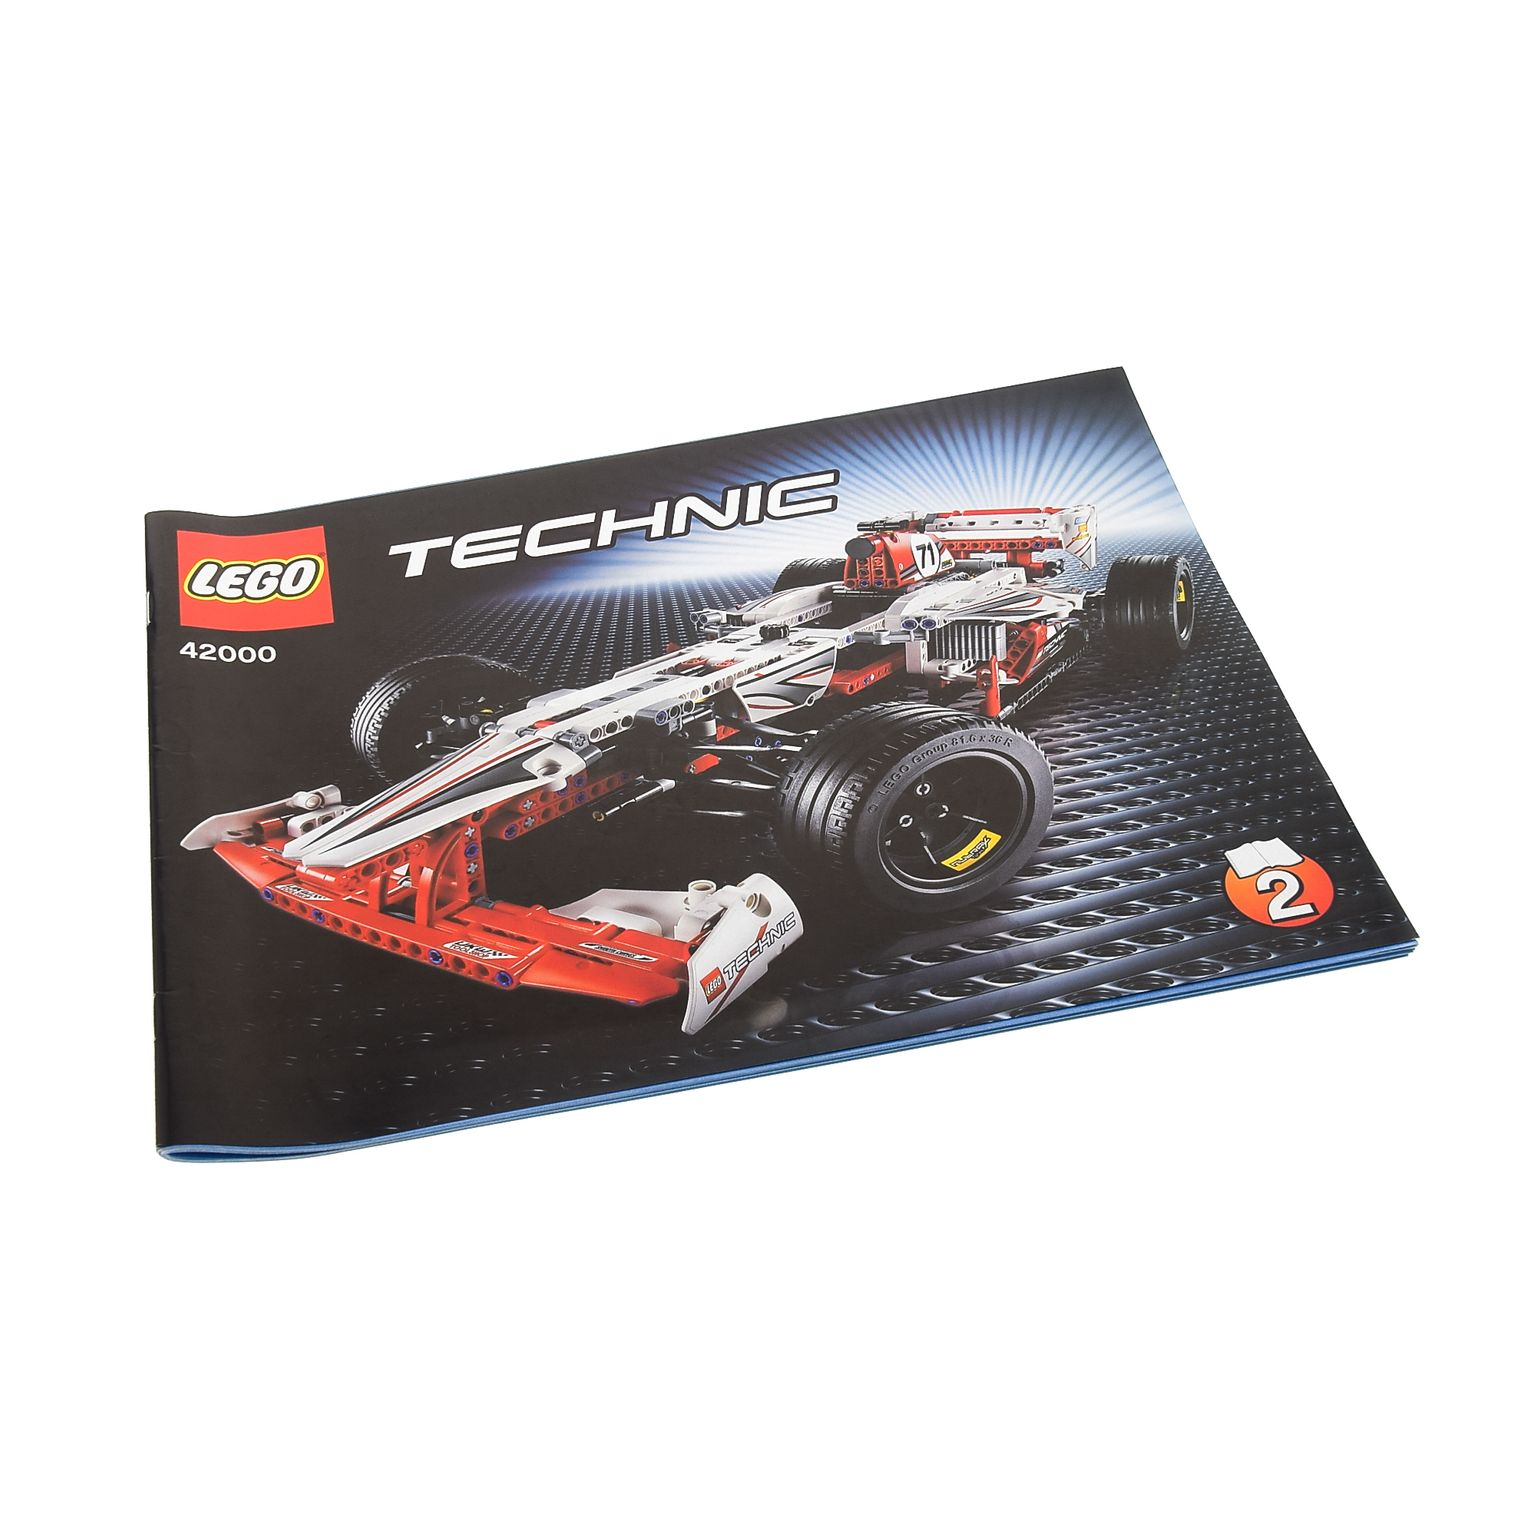 LEGO/DUPLO Spezialist | 1 x Lego brick Technic Instructions Model Grand  Prix Racer Booklet 2 42000